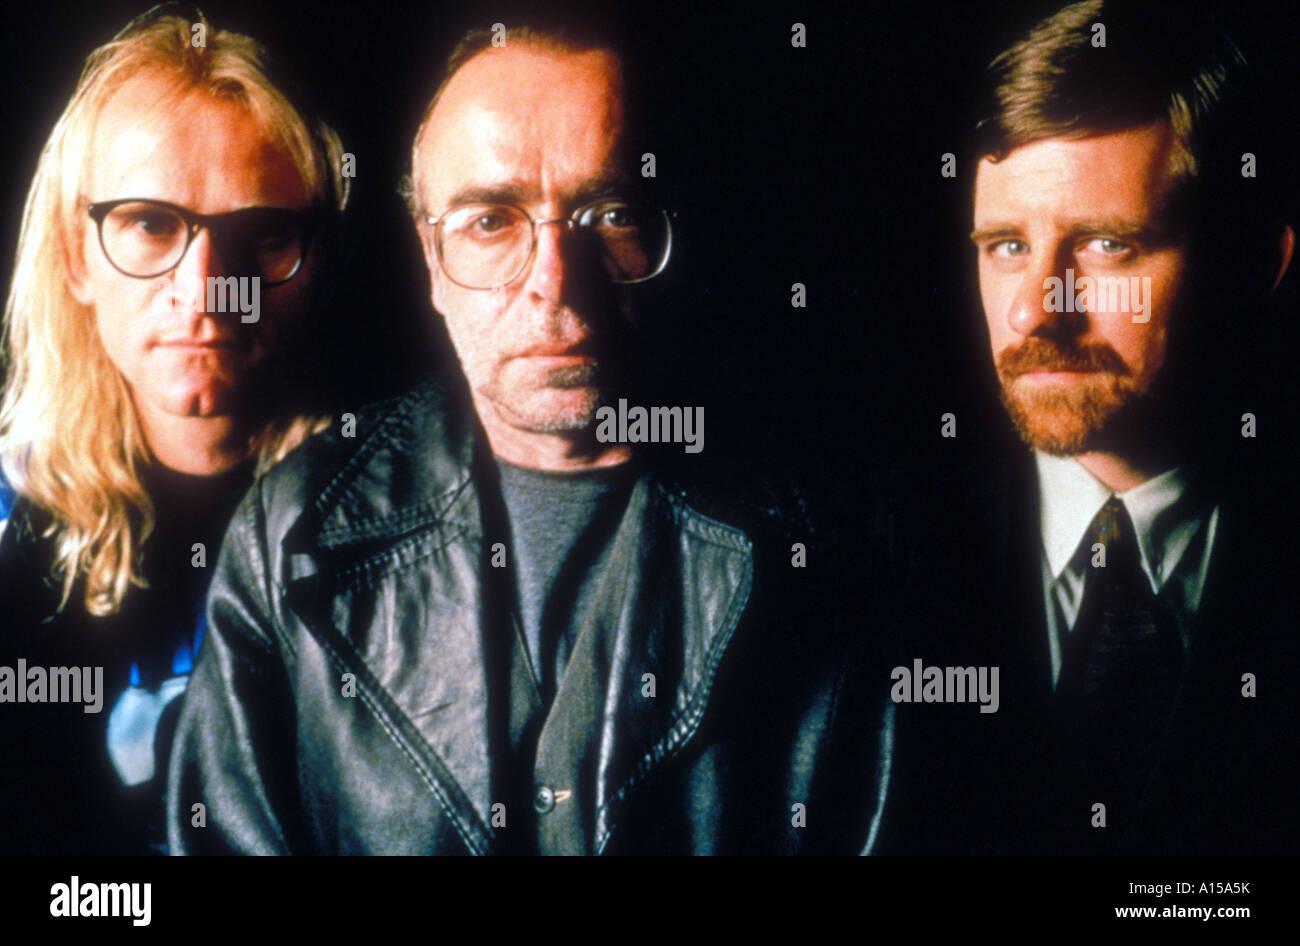 The X Files The Movie Year 1998 Director Rob Bowman Dean Haglund Tom Braidwood Bruce Harwood - Stock Image